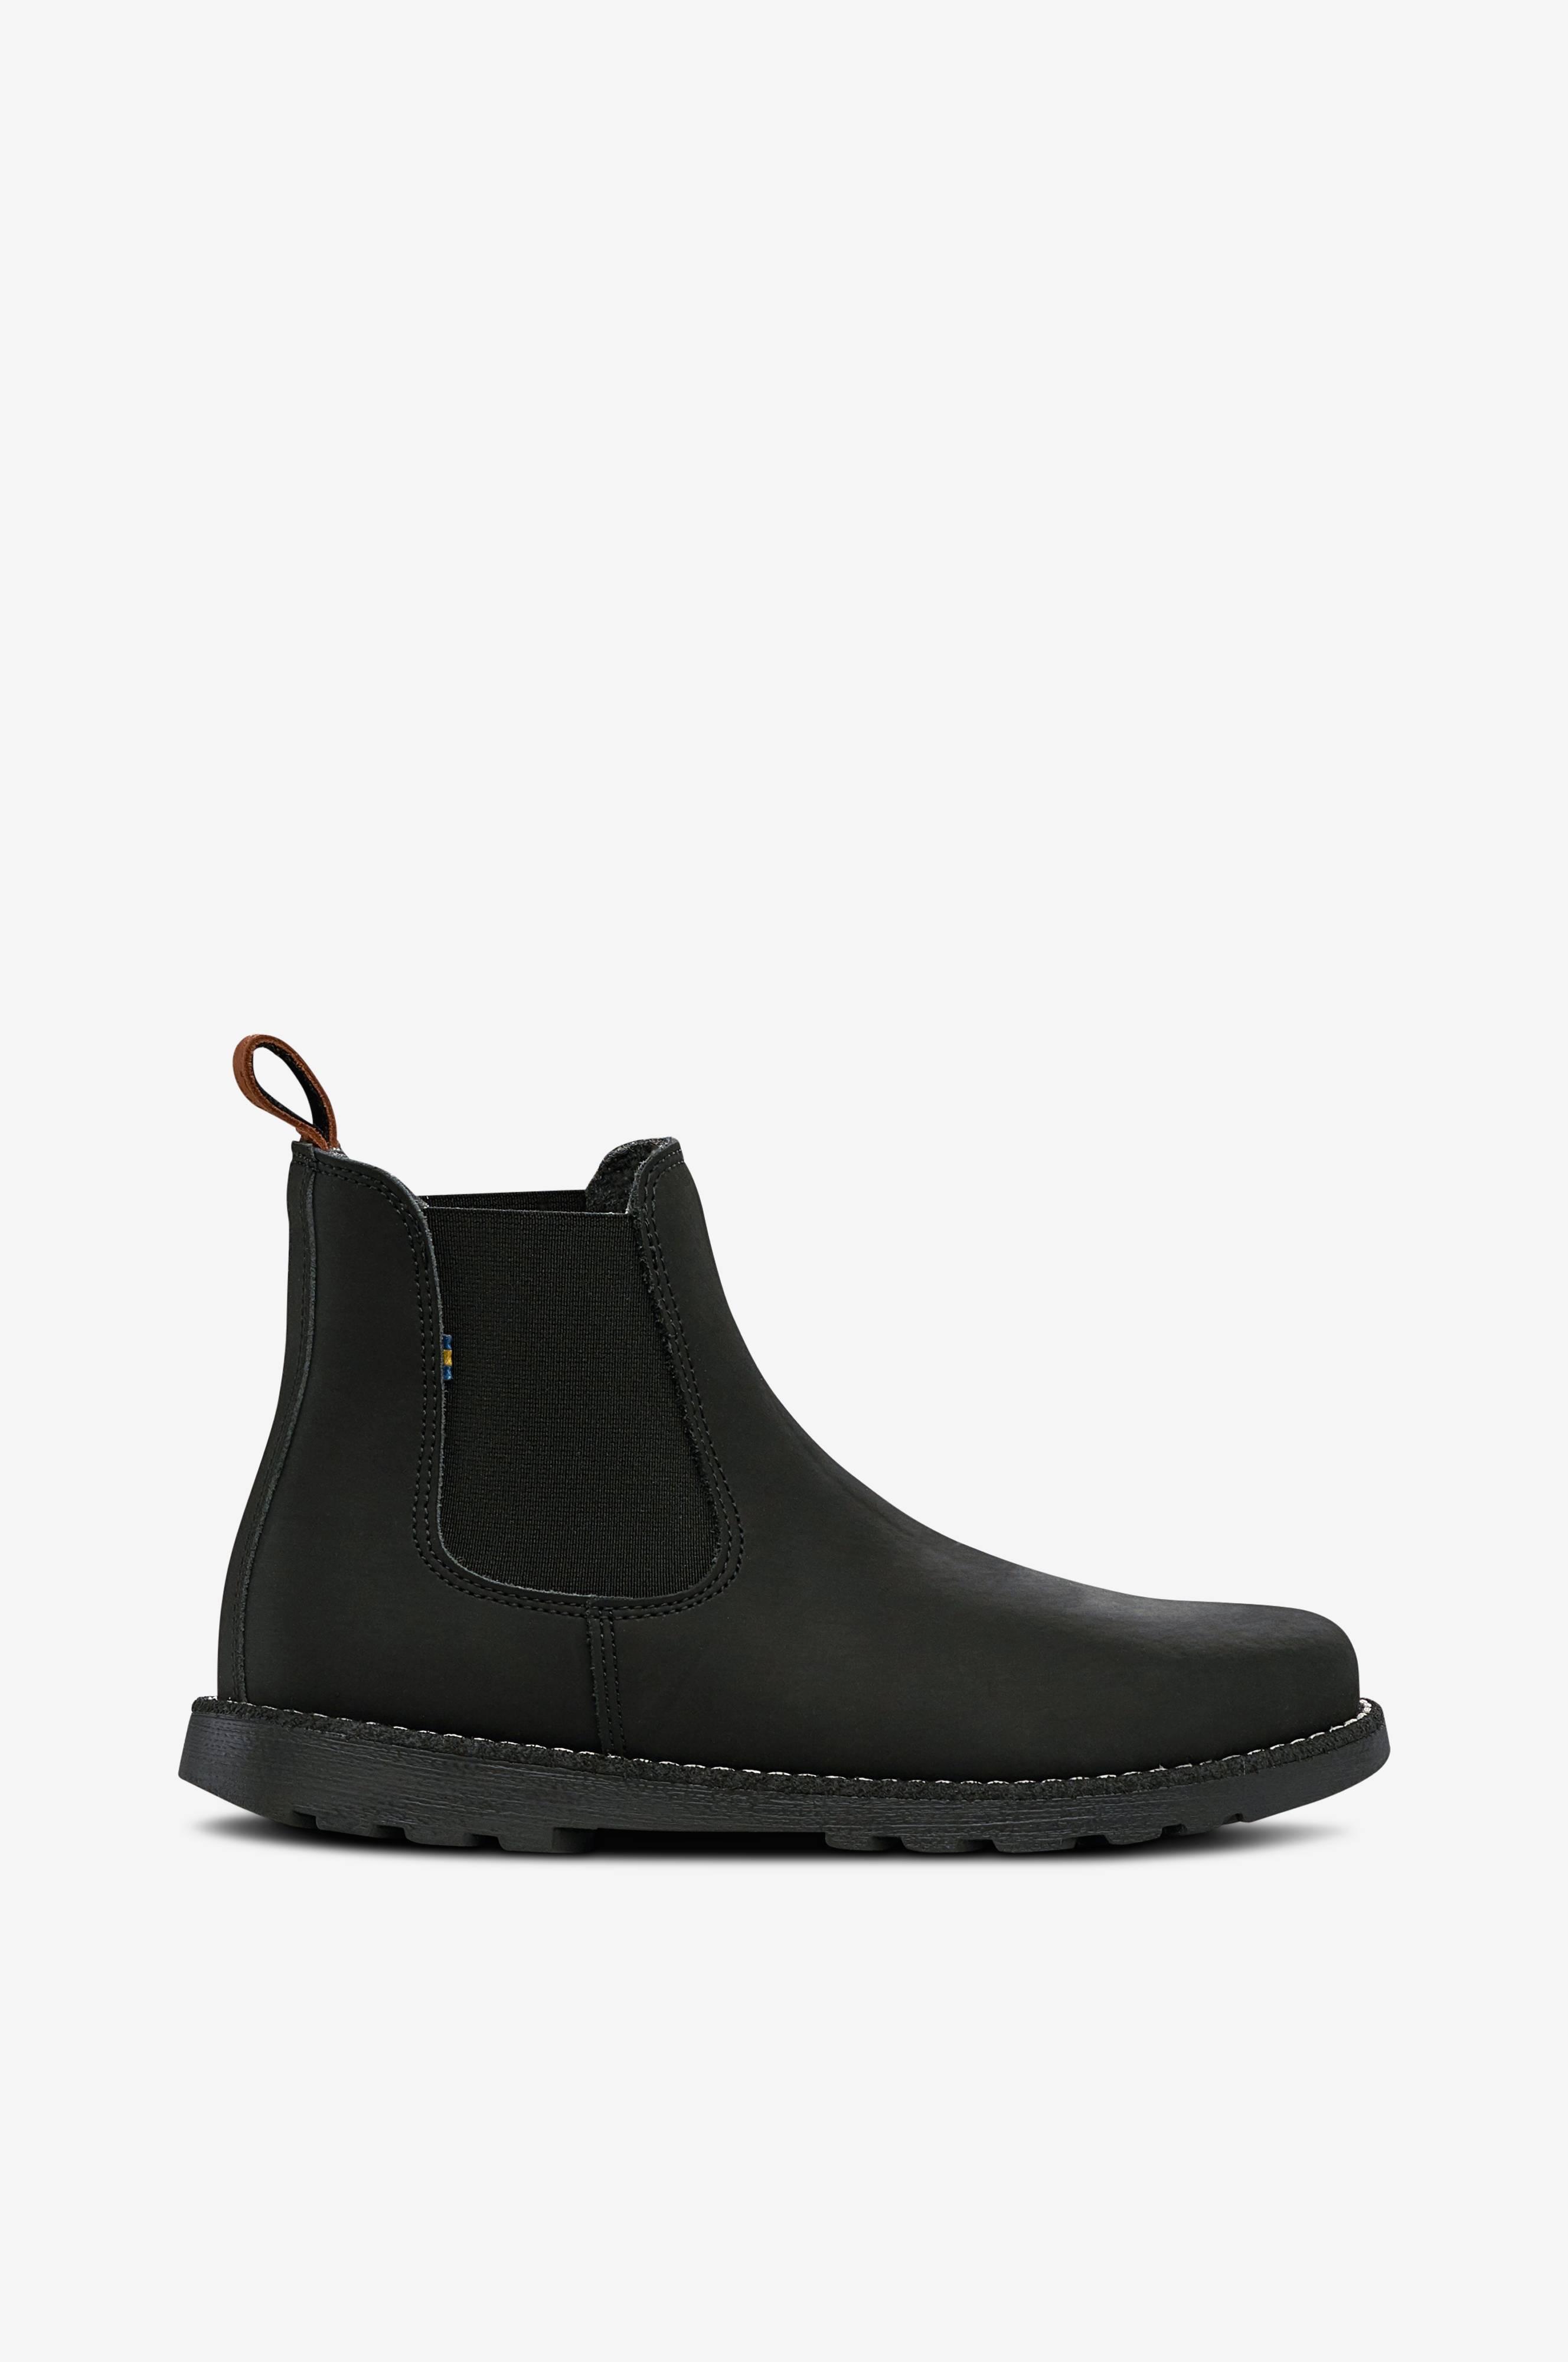 8eb03140 Kavat Chelsea-boots Bodås Jr XC - Sort - Børn - Ellos.dk